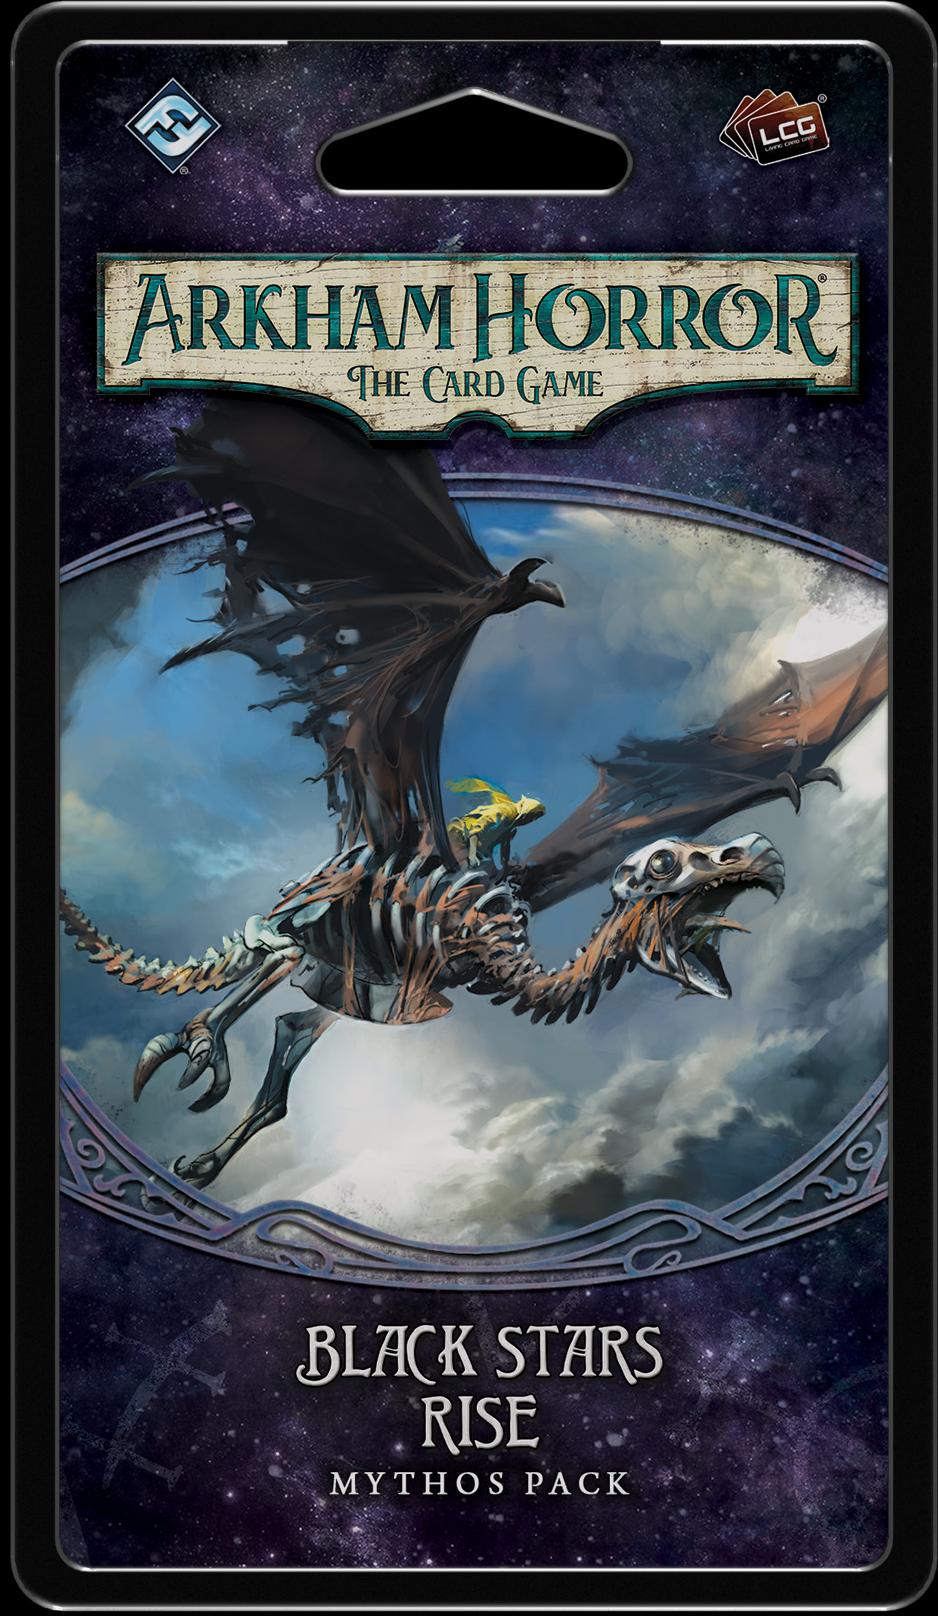 Arkham Horror: The Card Game (LCG) - Black Stars Rise Mythos Pack